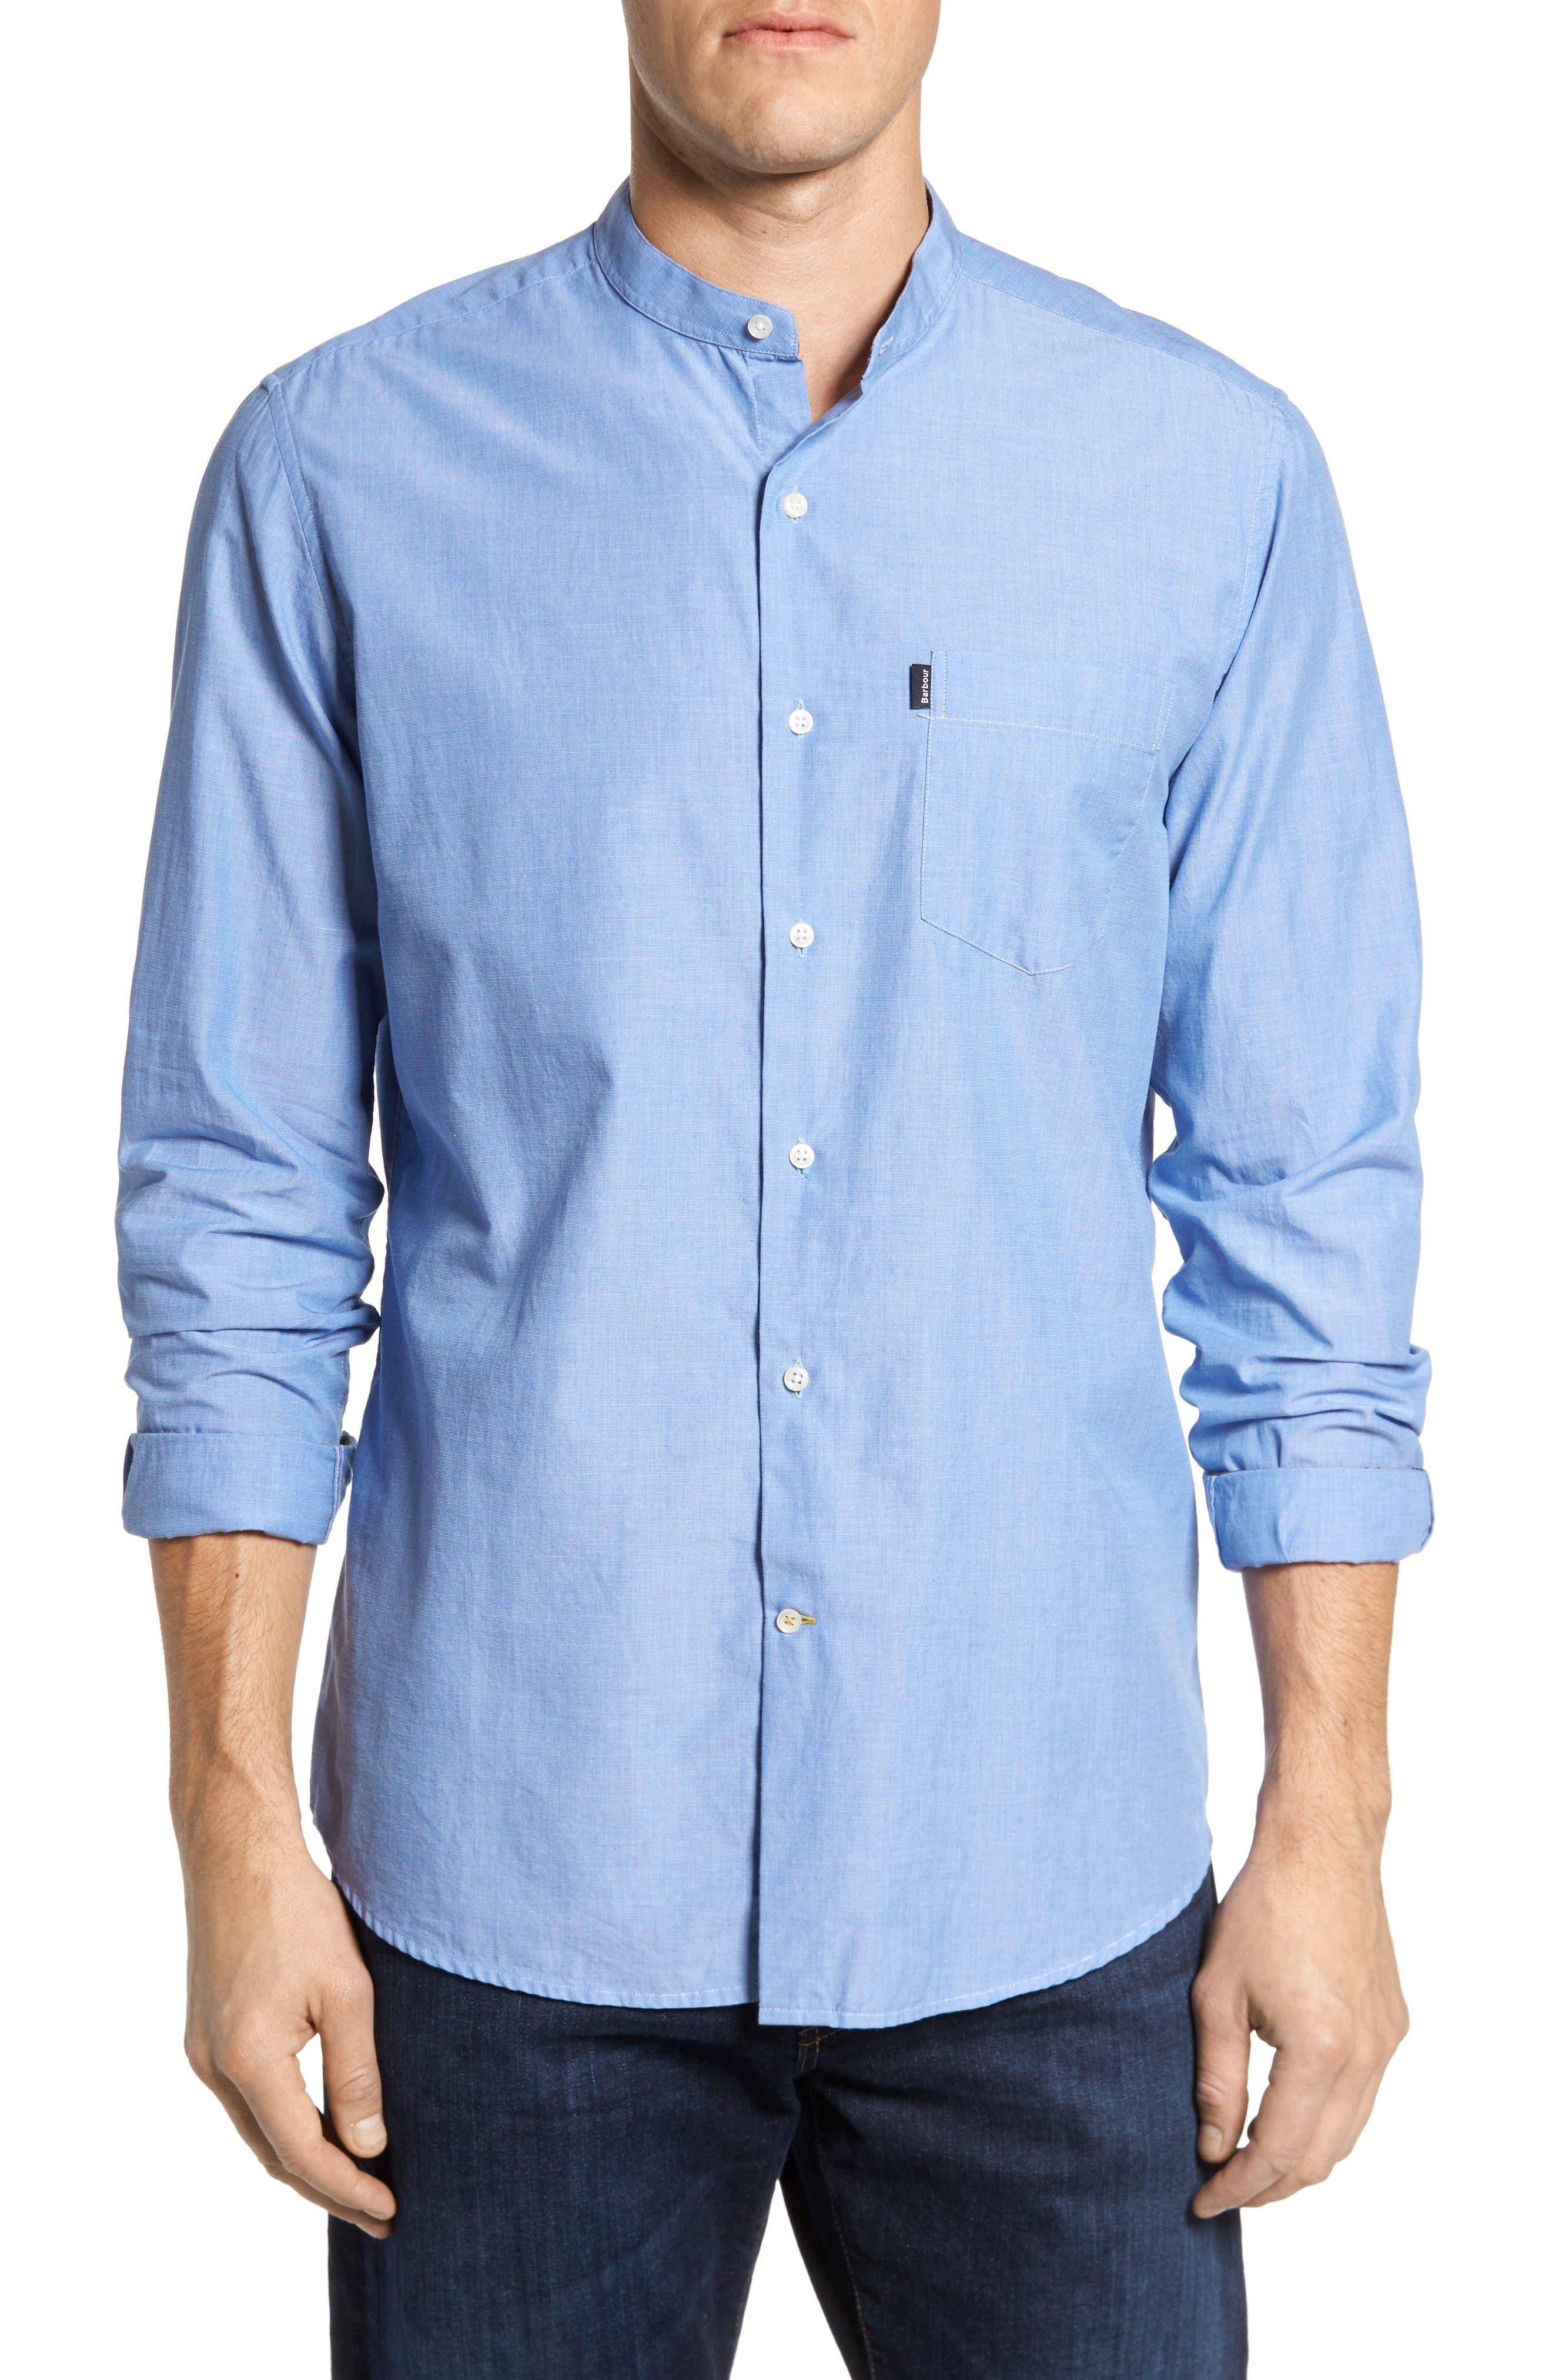 Fairfield Tailored Fit Sport Shirt,                             Main thumbnail 1, color,                             450